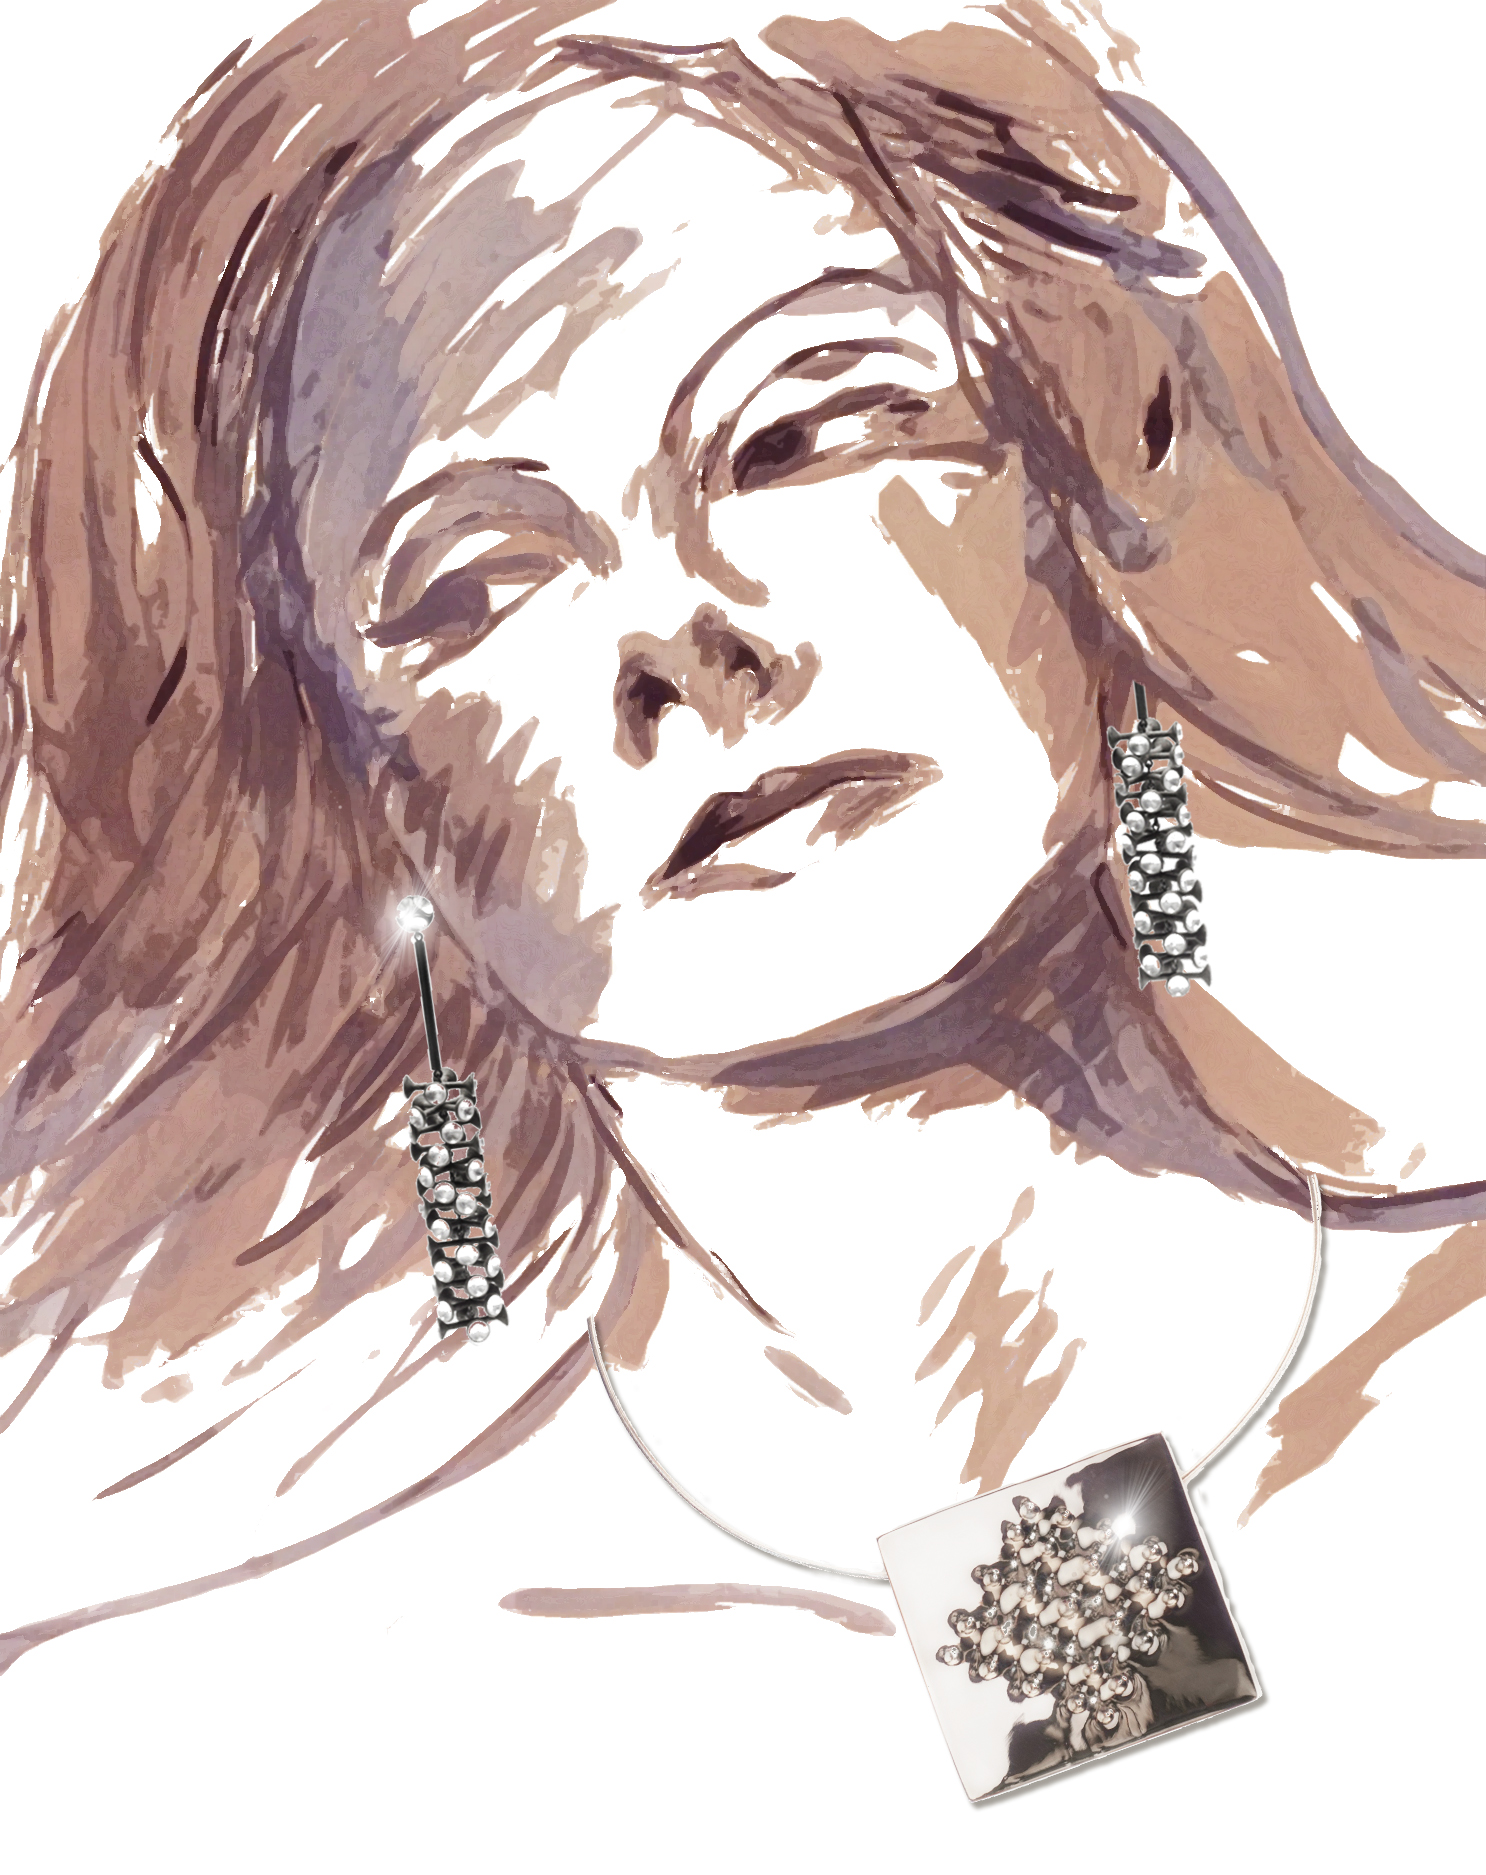 27- Enrico Castellani Superficie necklace; Carol Bove Untitled earrings